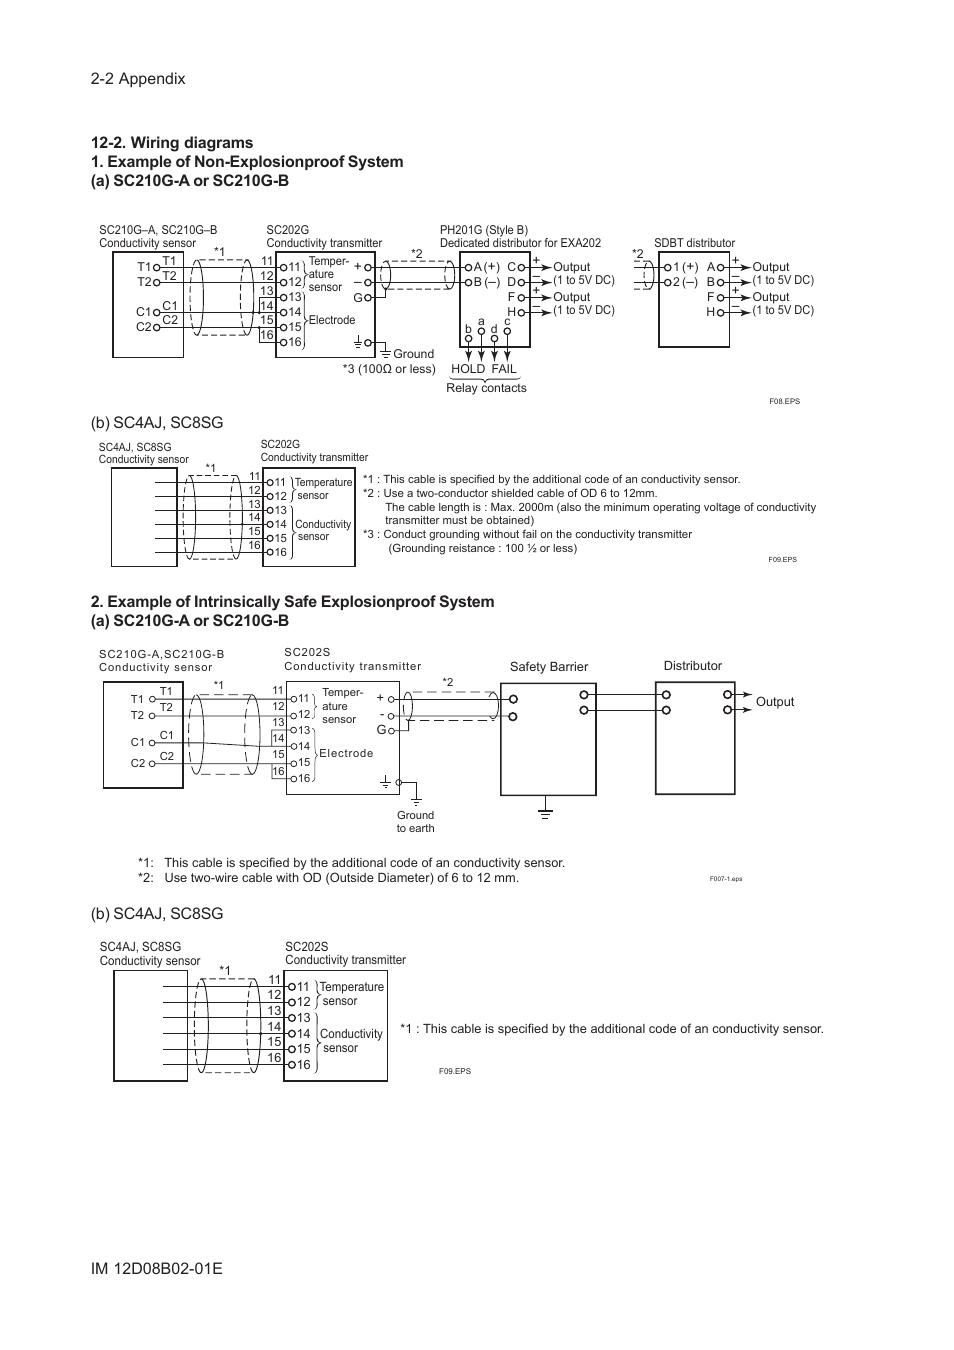 medium resolution of 2 wiring diagrams example of non explosionproof system b sc4aj sc8sg yokogawa exa sc202 2 wire conductivity transmitter analyzer user manual page